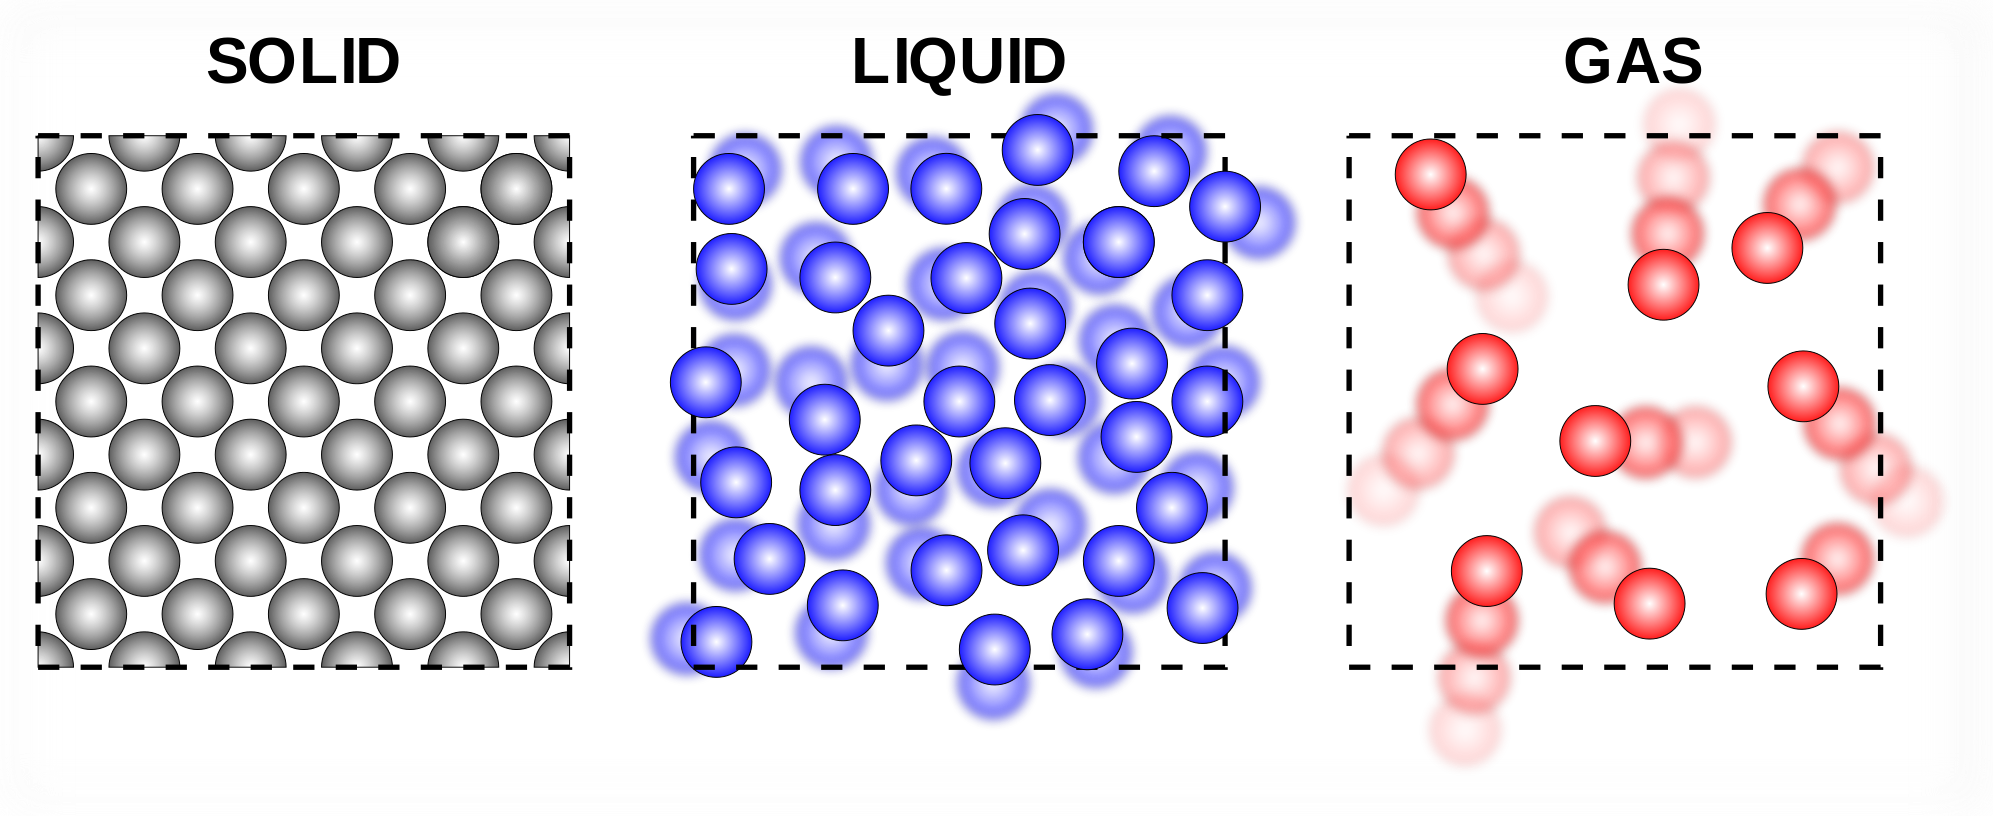 gas clipart solid liquid gas